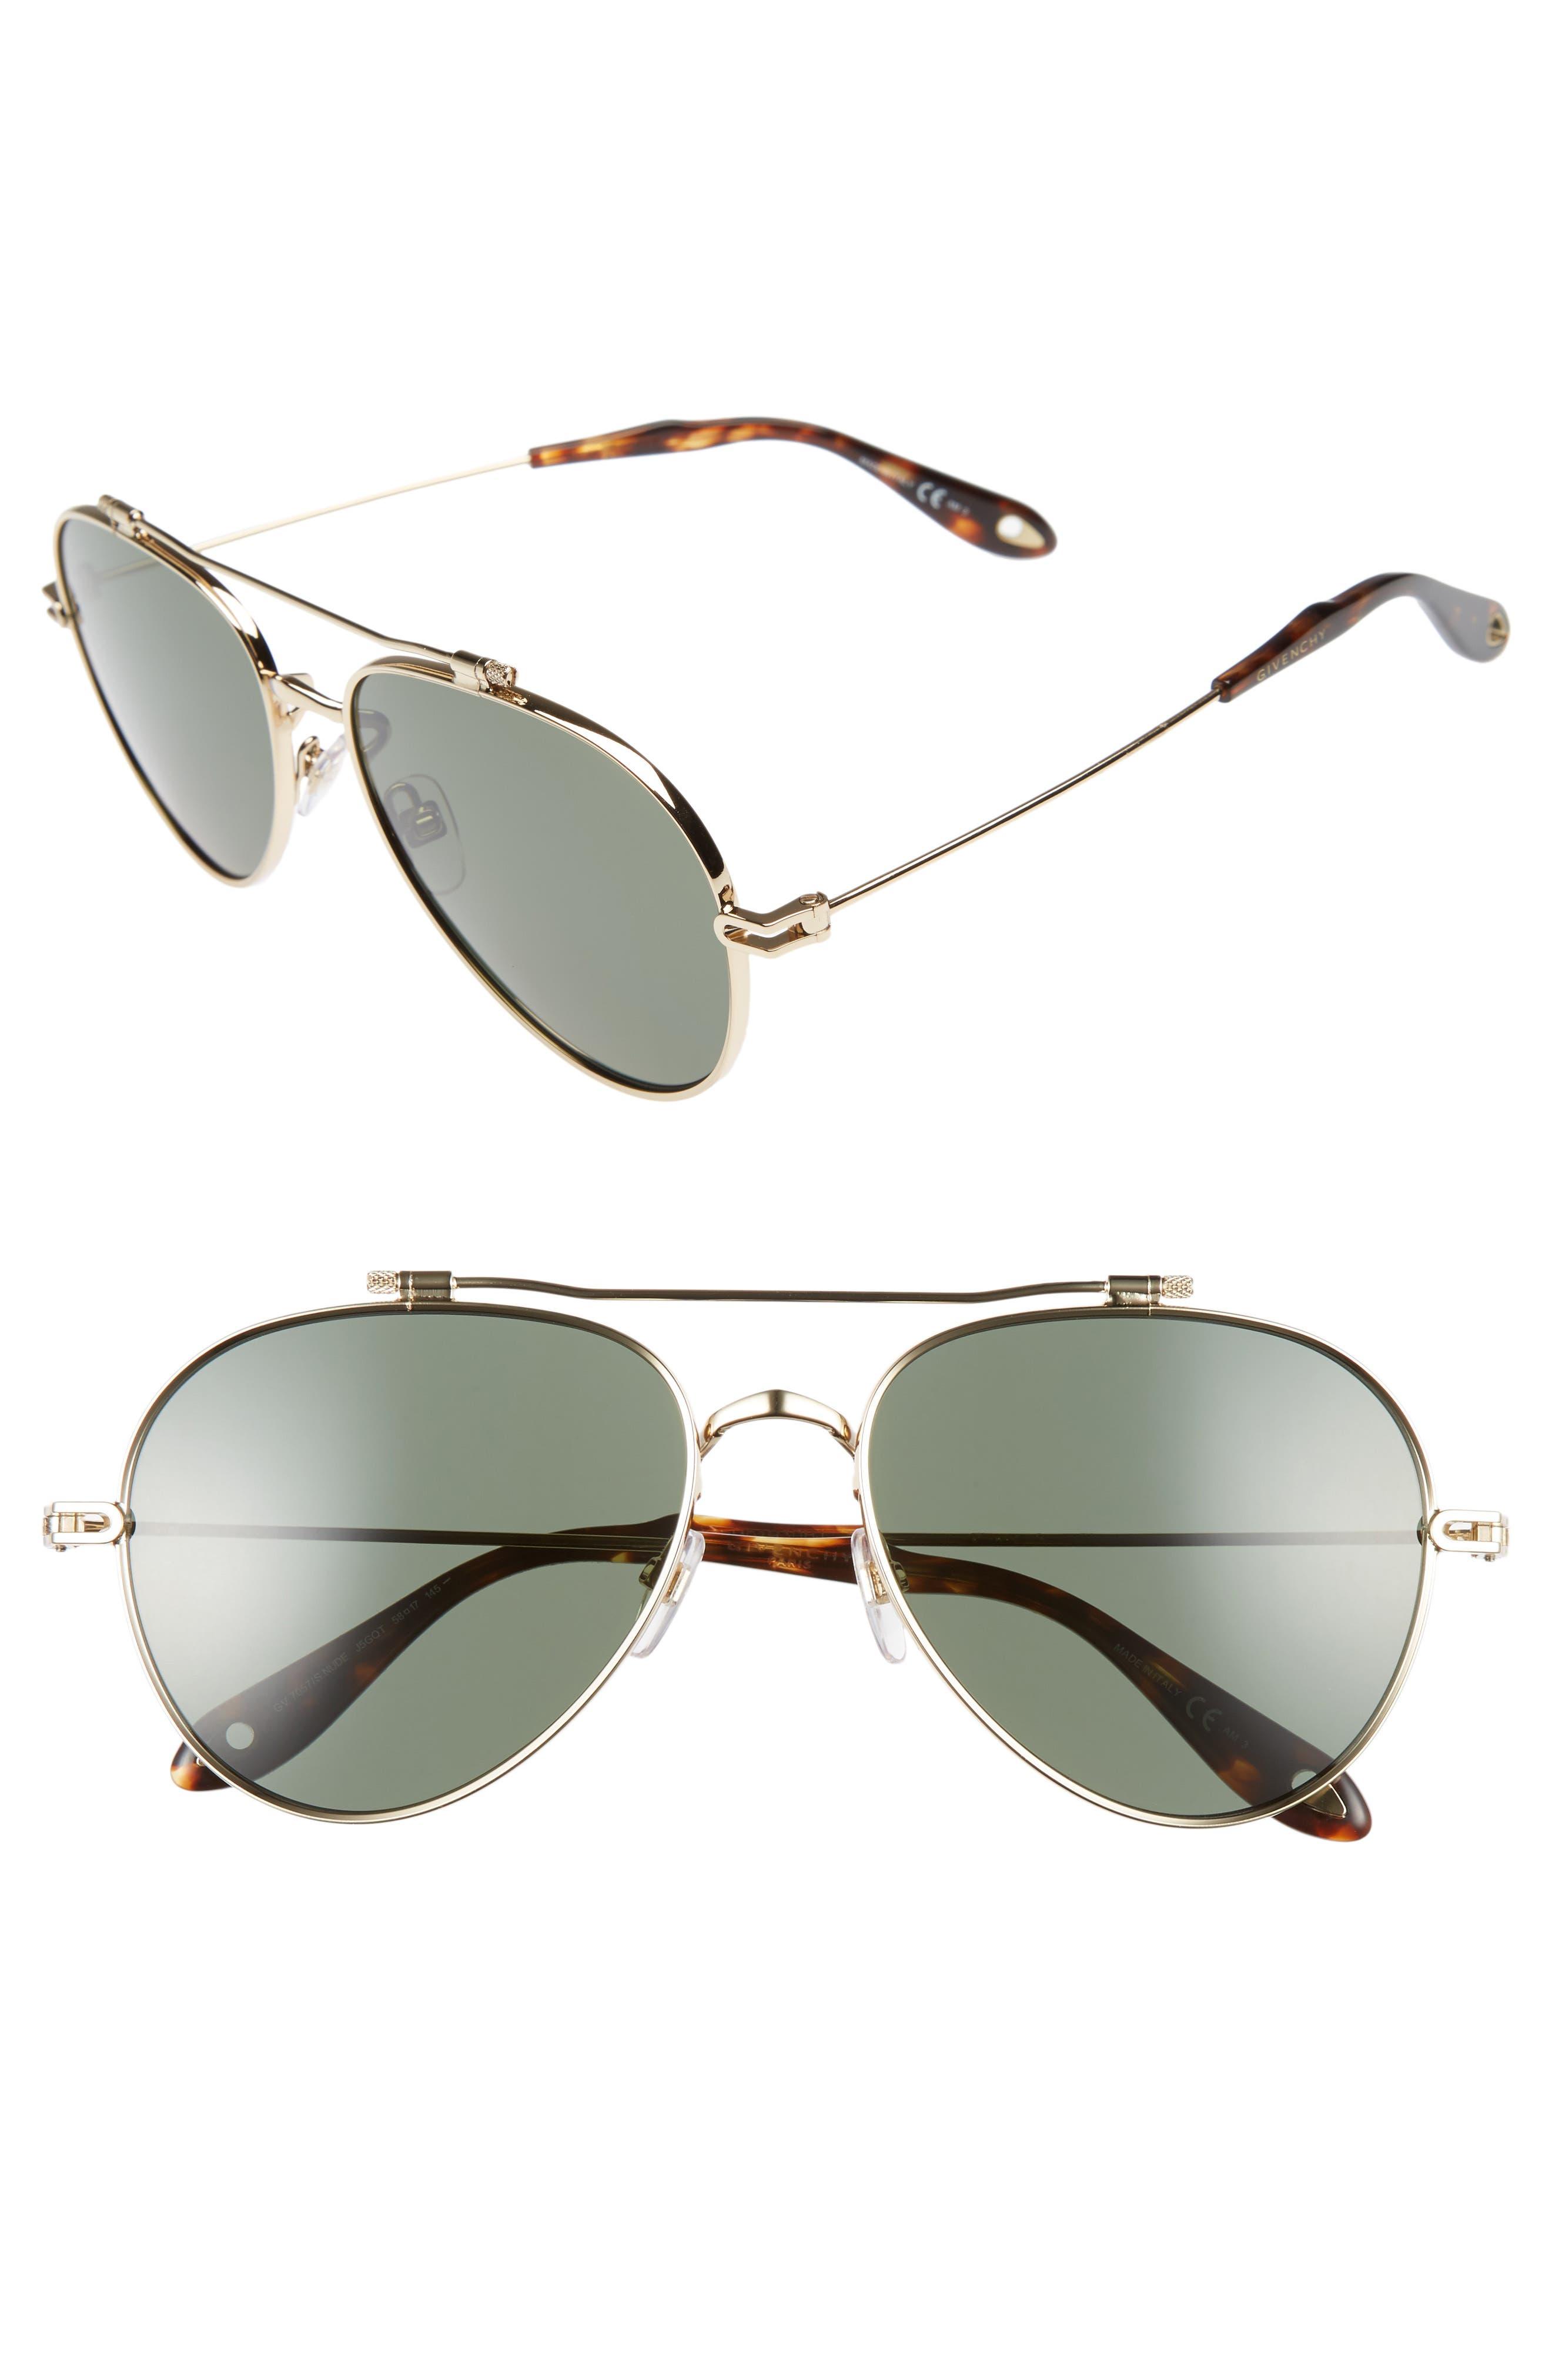 58mm Polarized Aviator Sunglasses,                             Main thumbnail 1, color,                             GOLD